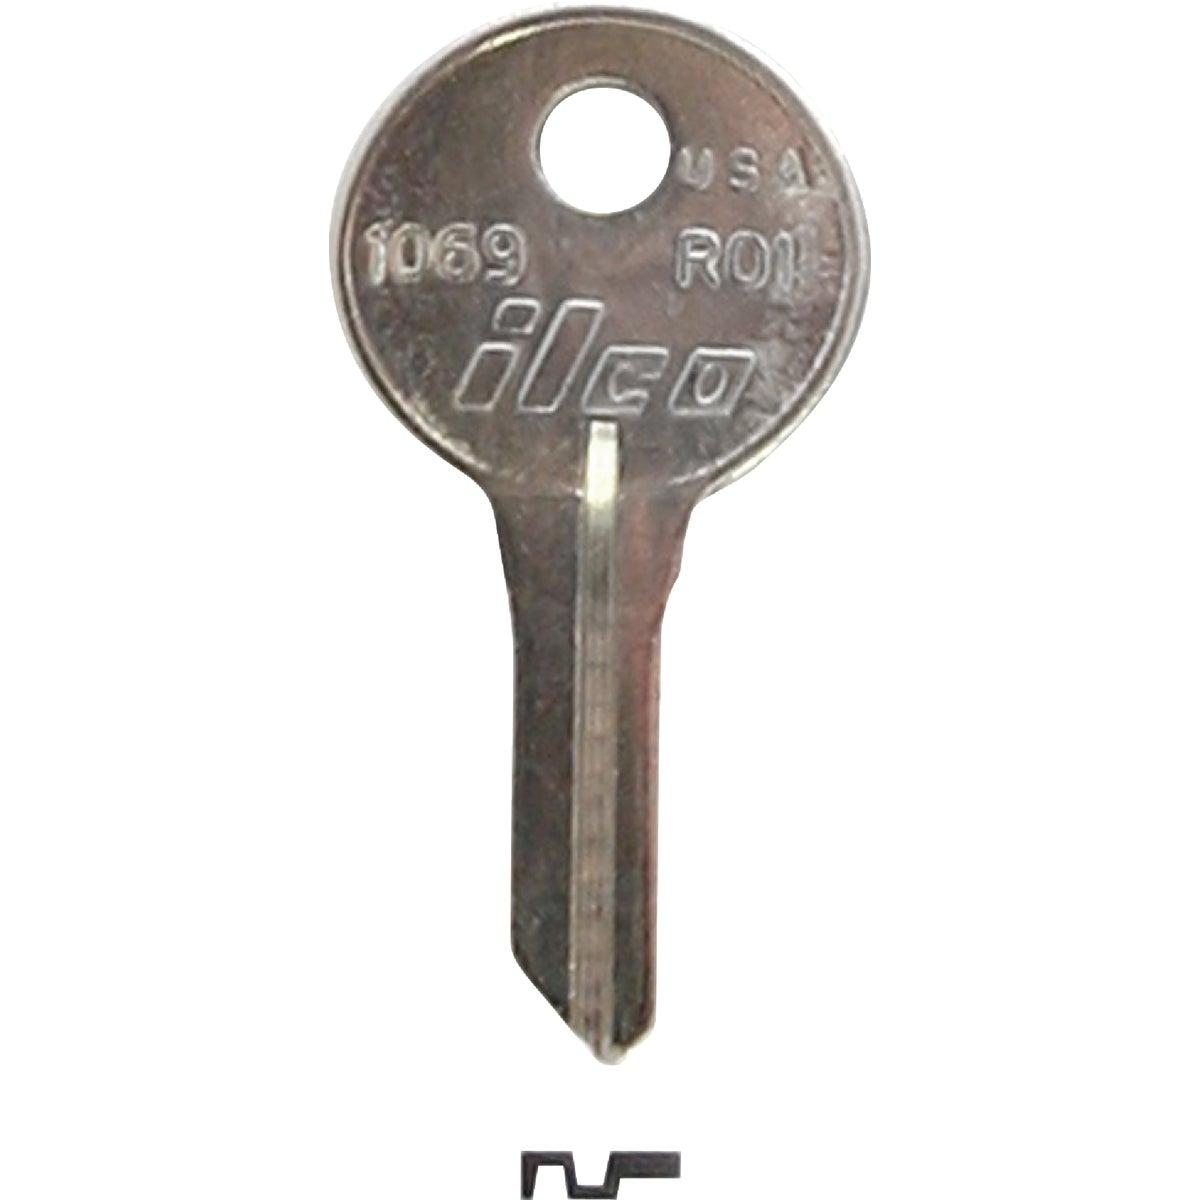 RO1 RUSSWIN CABINET KEY - 1069 by Ilco Corp